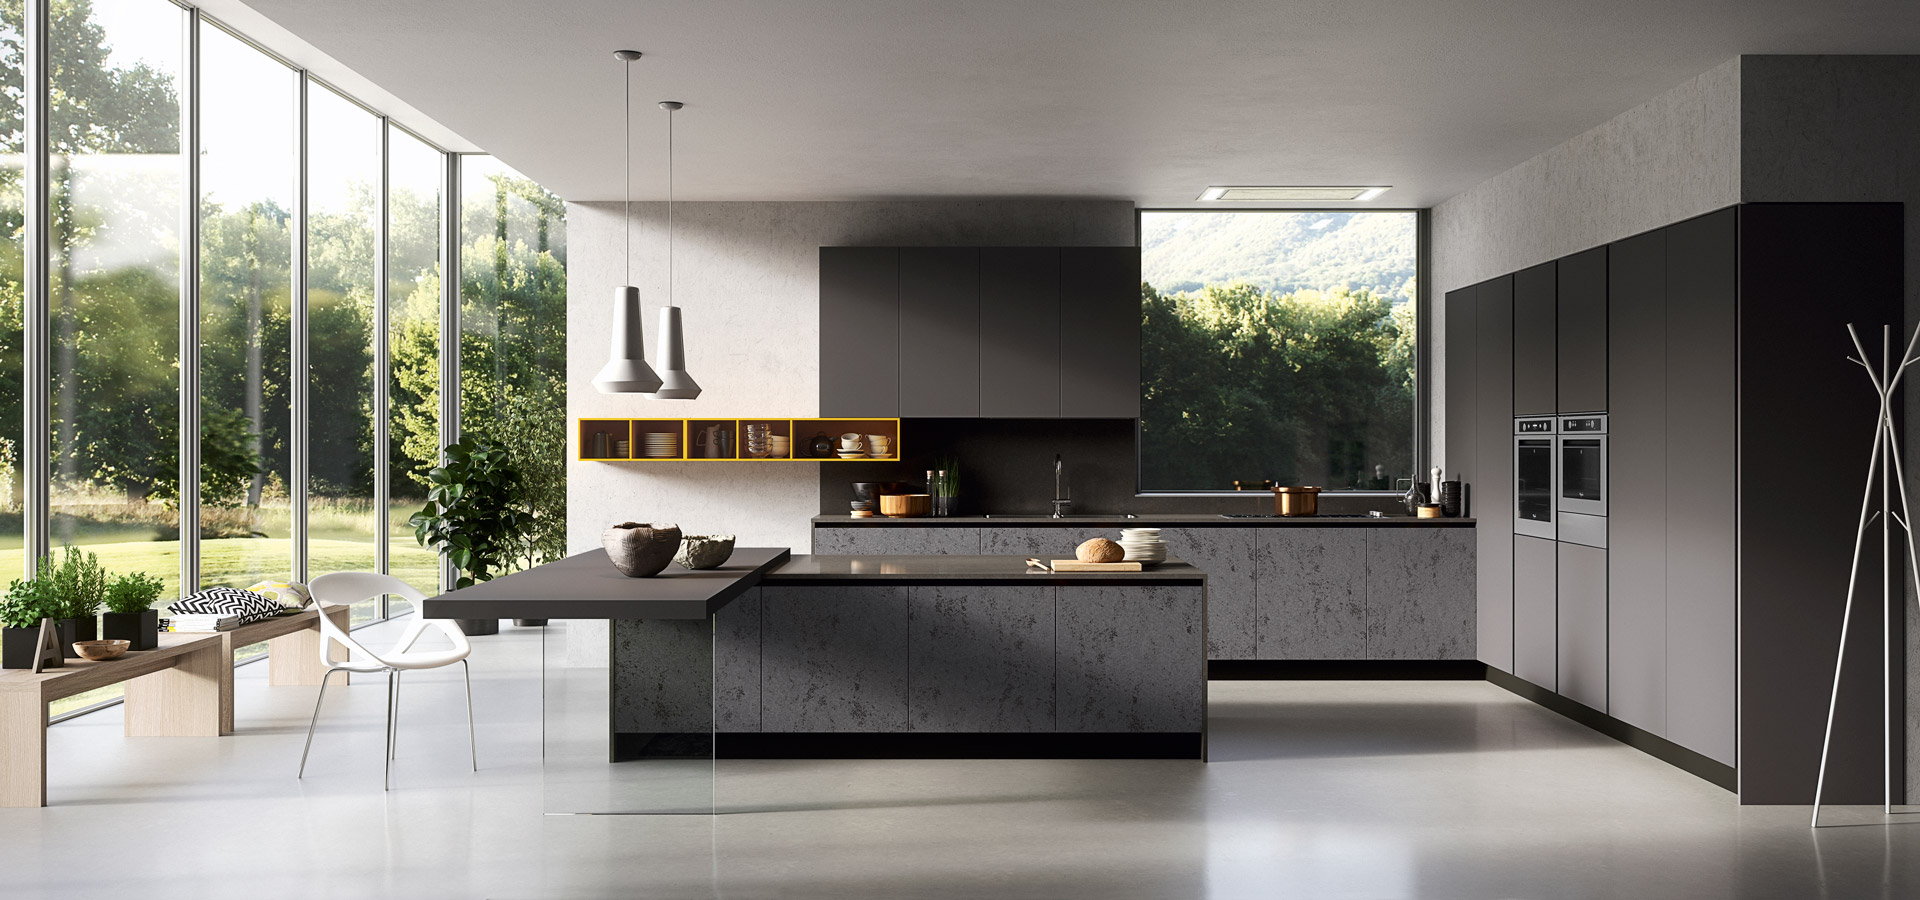 GLASS — modern kitchen | ARREDO3